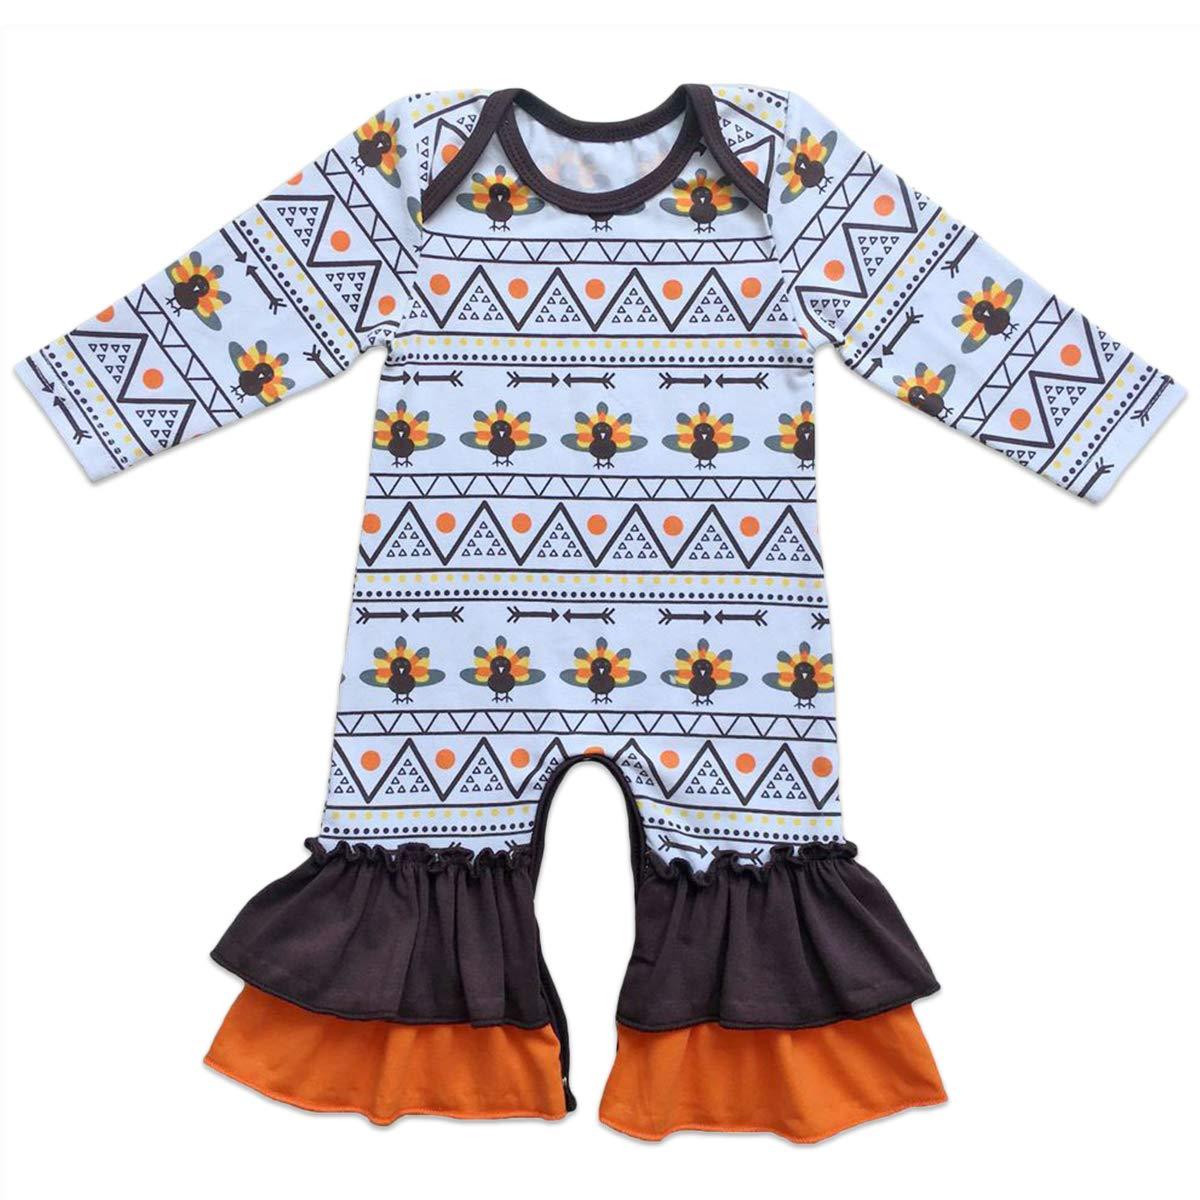 Newborn Baby Girls Icing Ruffle Jumpsuit Pants One Piece Romper Toddler Kids Christmas Striped Pajama Nightwear Sleepwear Long Sleeve Floral Bodysuit Pyjamas Pjs Homewear Outfit Birthday Party Clothes